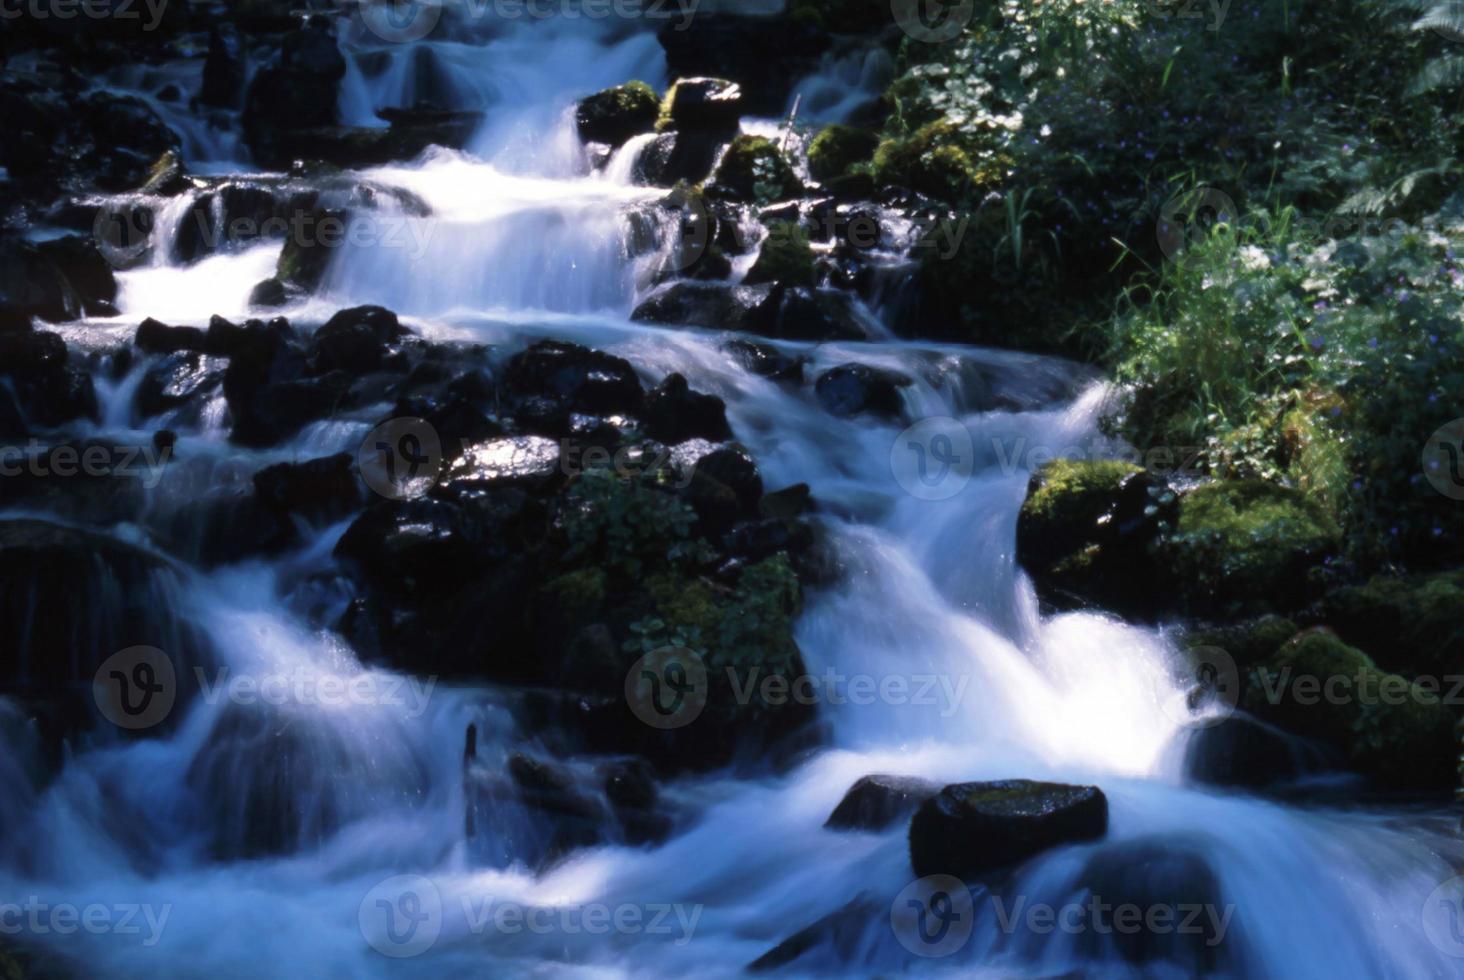 Oregon en plein air photo